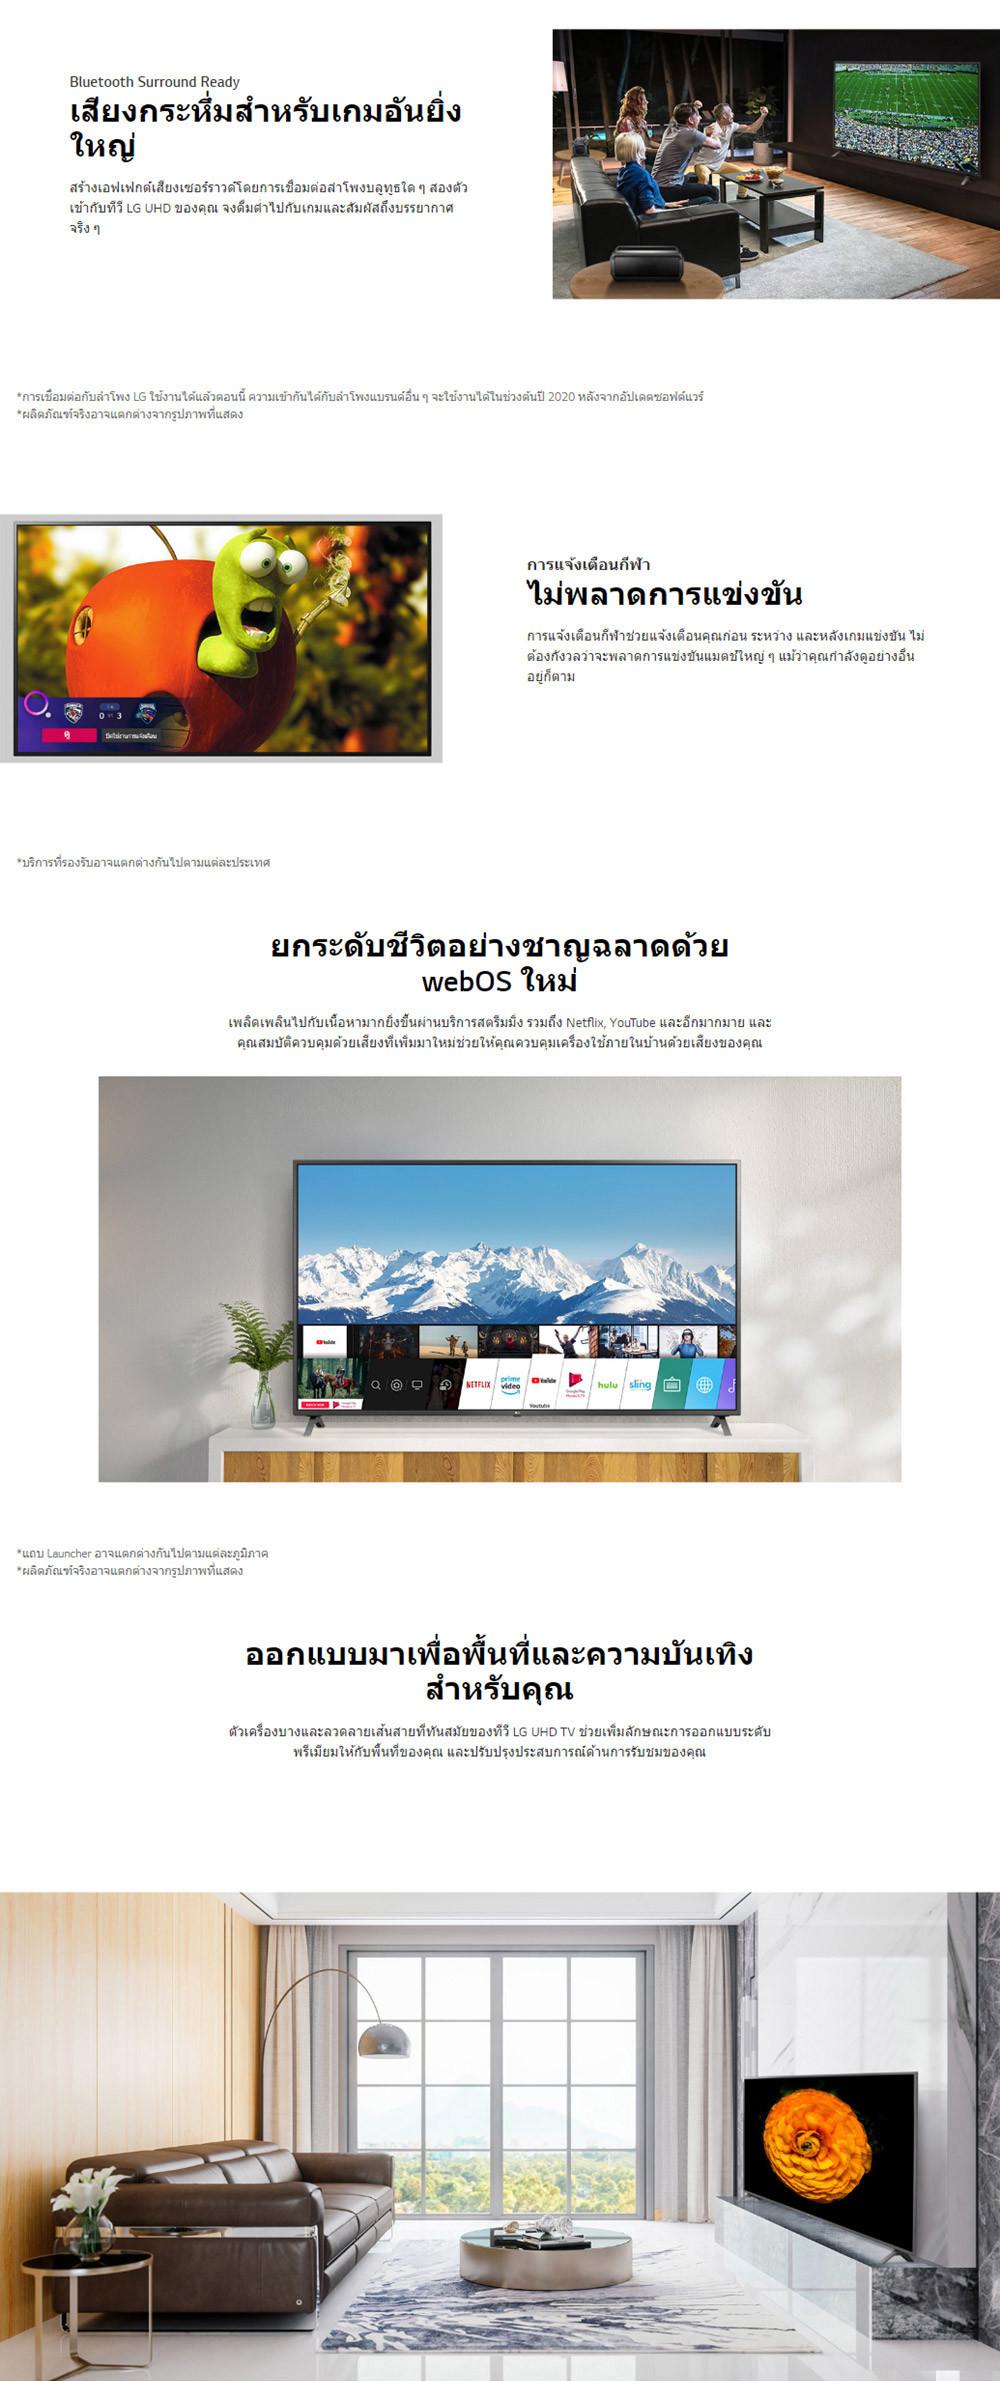 content-image-1_3.jpg